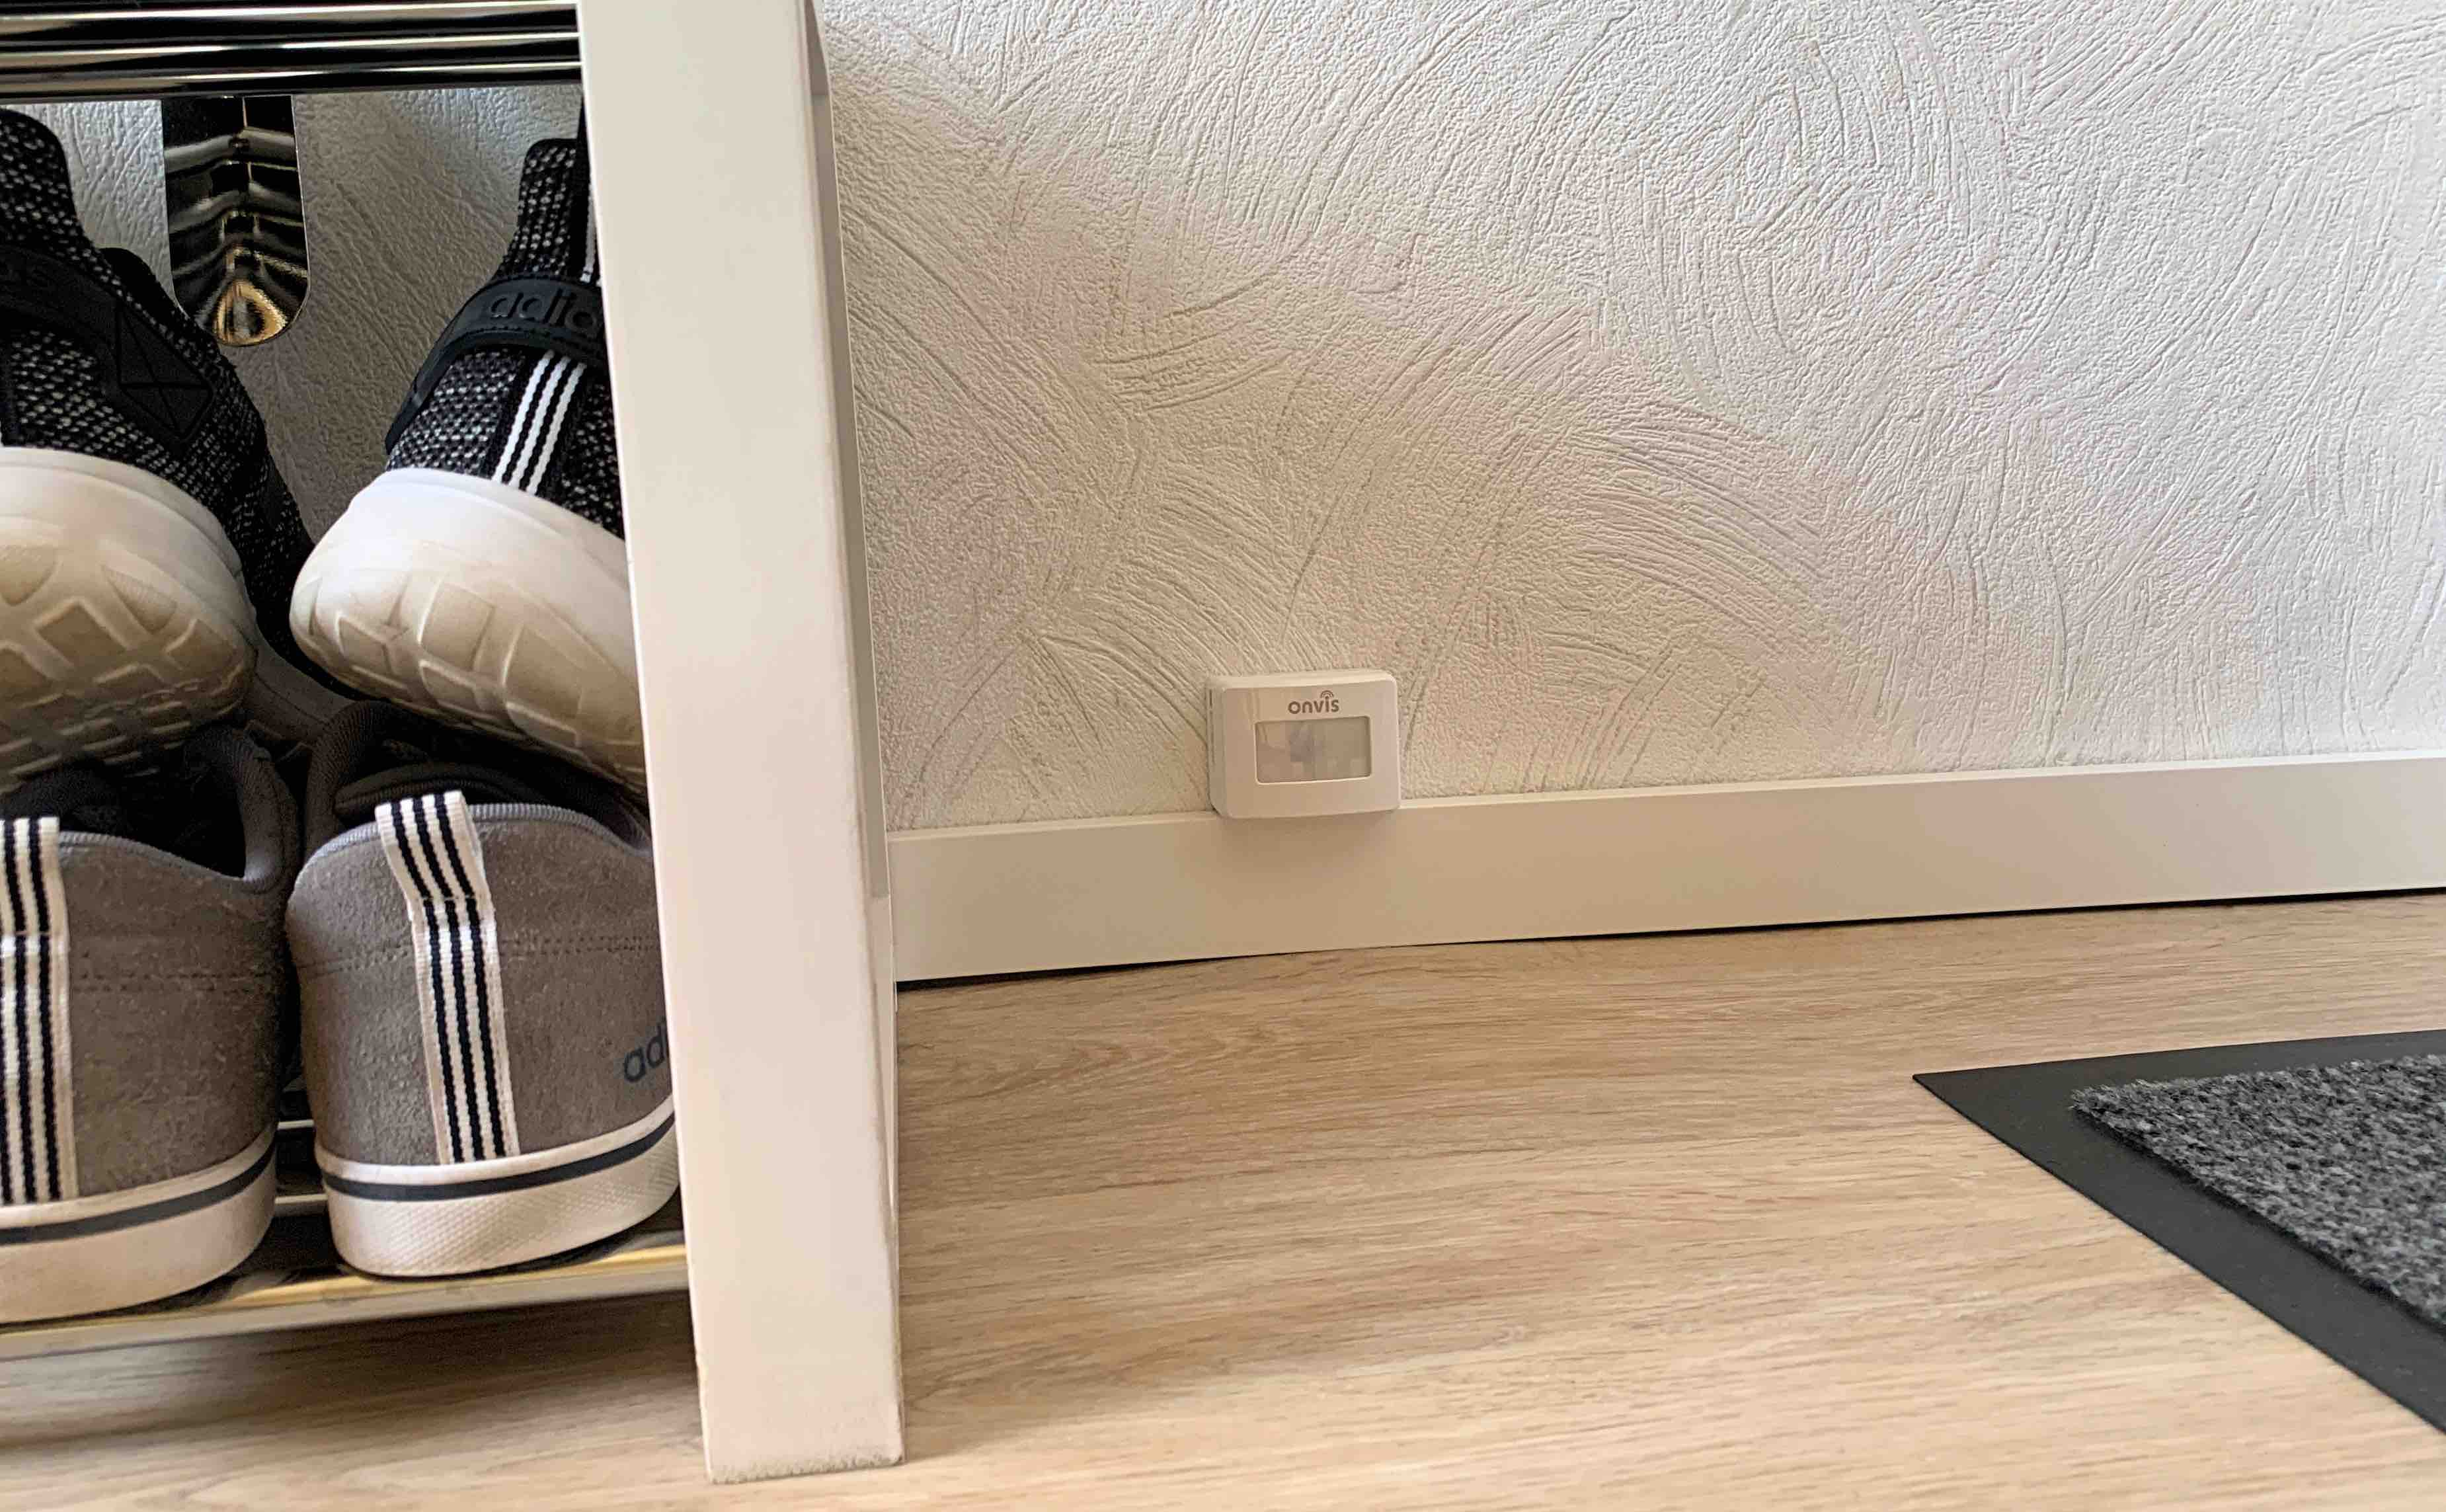 Onvis_Motion_Sensor_Bewegung_HomeKit3 Bewegungssensor von Onvis - ein cleveres 3-in-1 HomeKit-Gerät